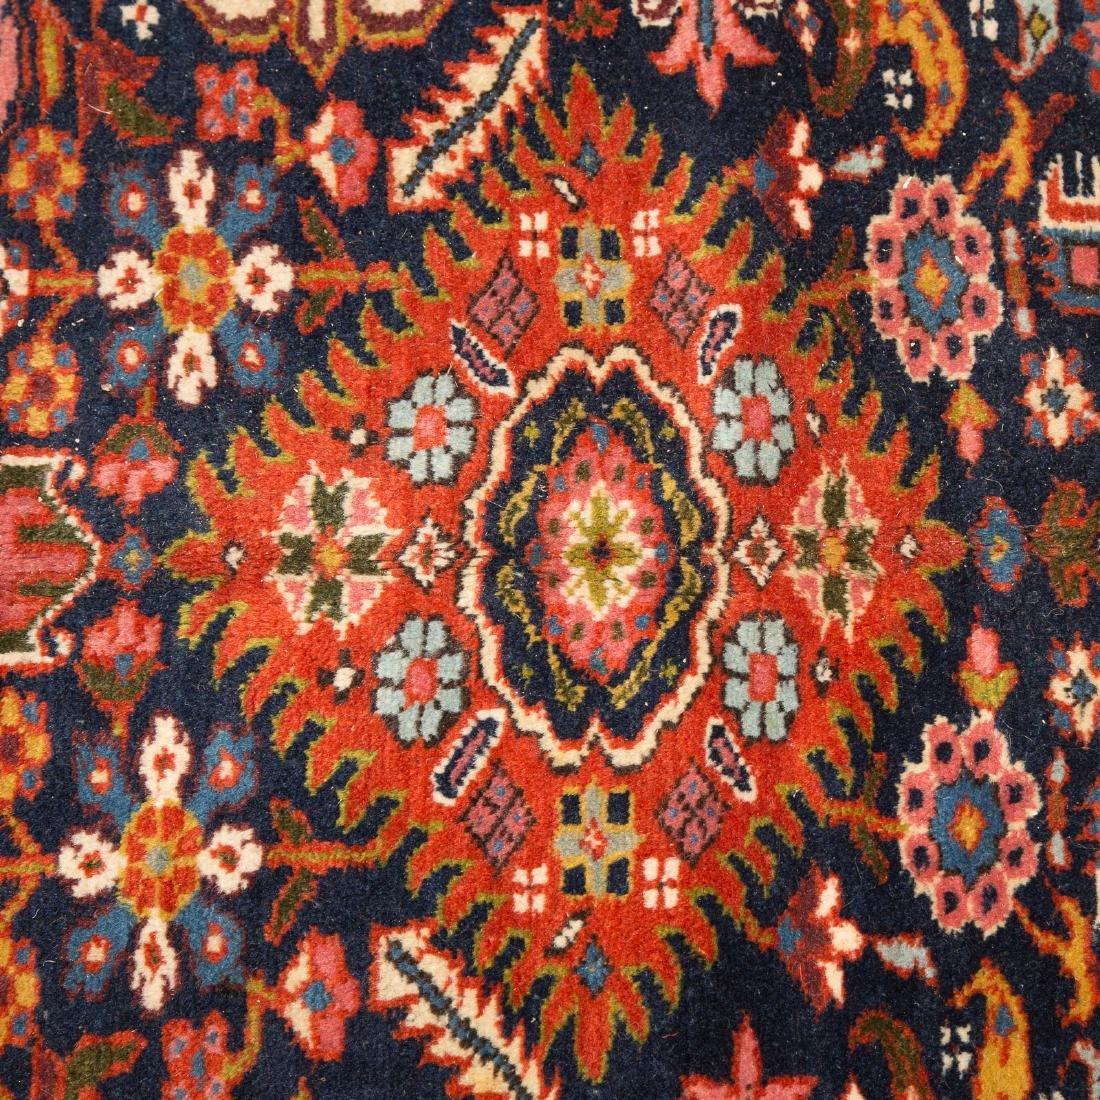 Antique Karaja Herez rug, approx. 8.5 x 10.1 - 4